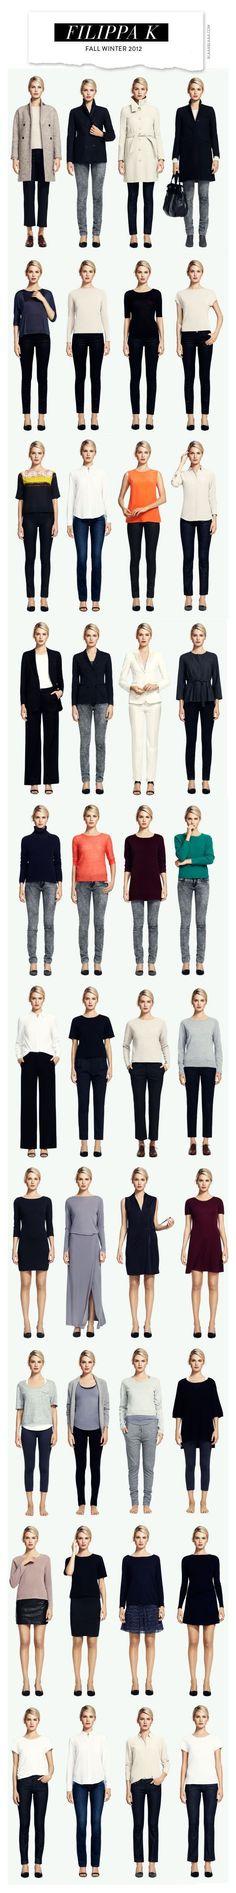 Plain & simple: basic 2-piece dressing - embellish for individuality. Fall-Winter 2012, by Filippa K. #wardrobebasicsforfall